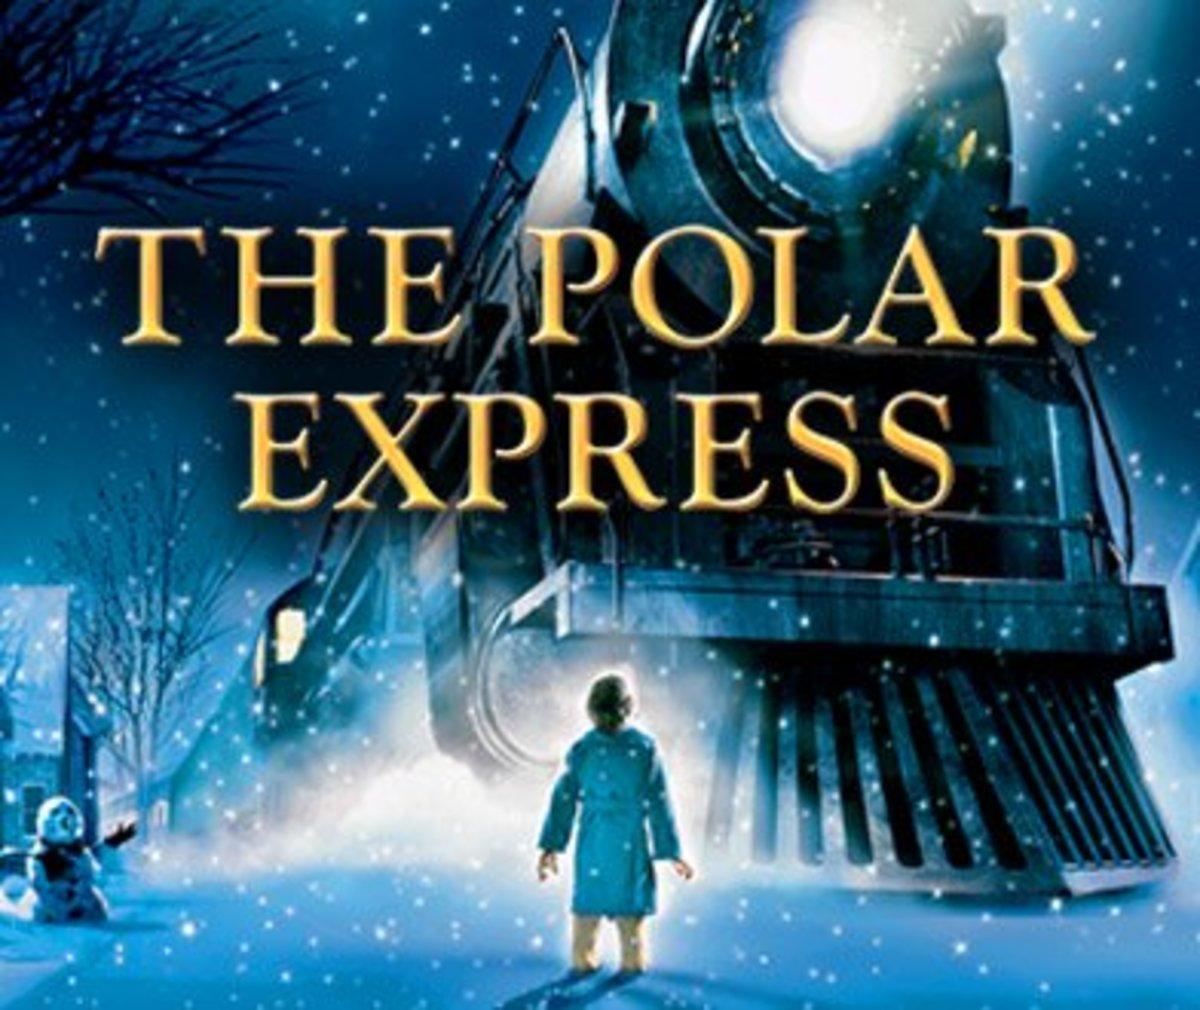 2004 The Polar Express Starring: Tom Hanks  Leslie Zemeckis, Eddie Deezen